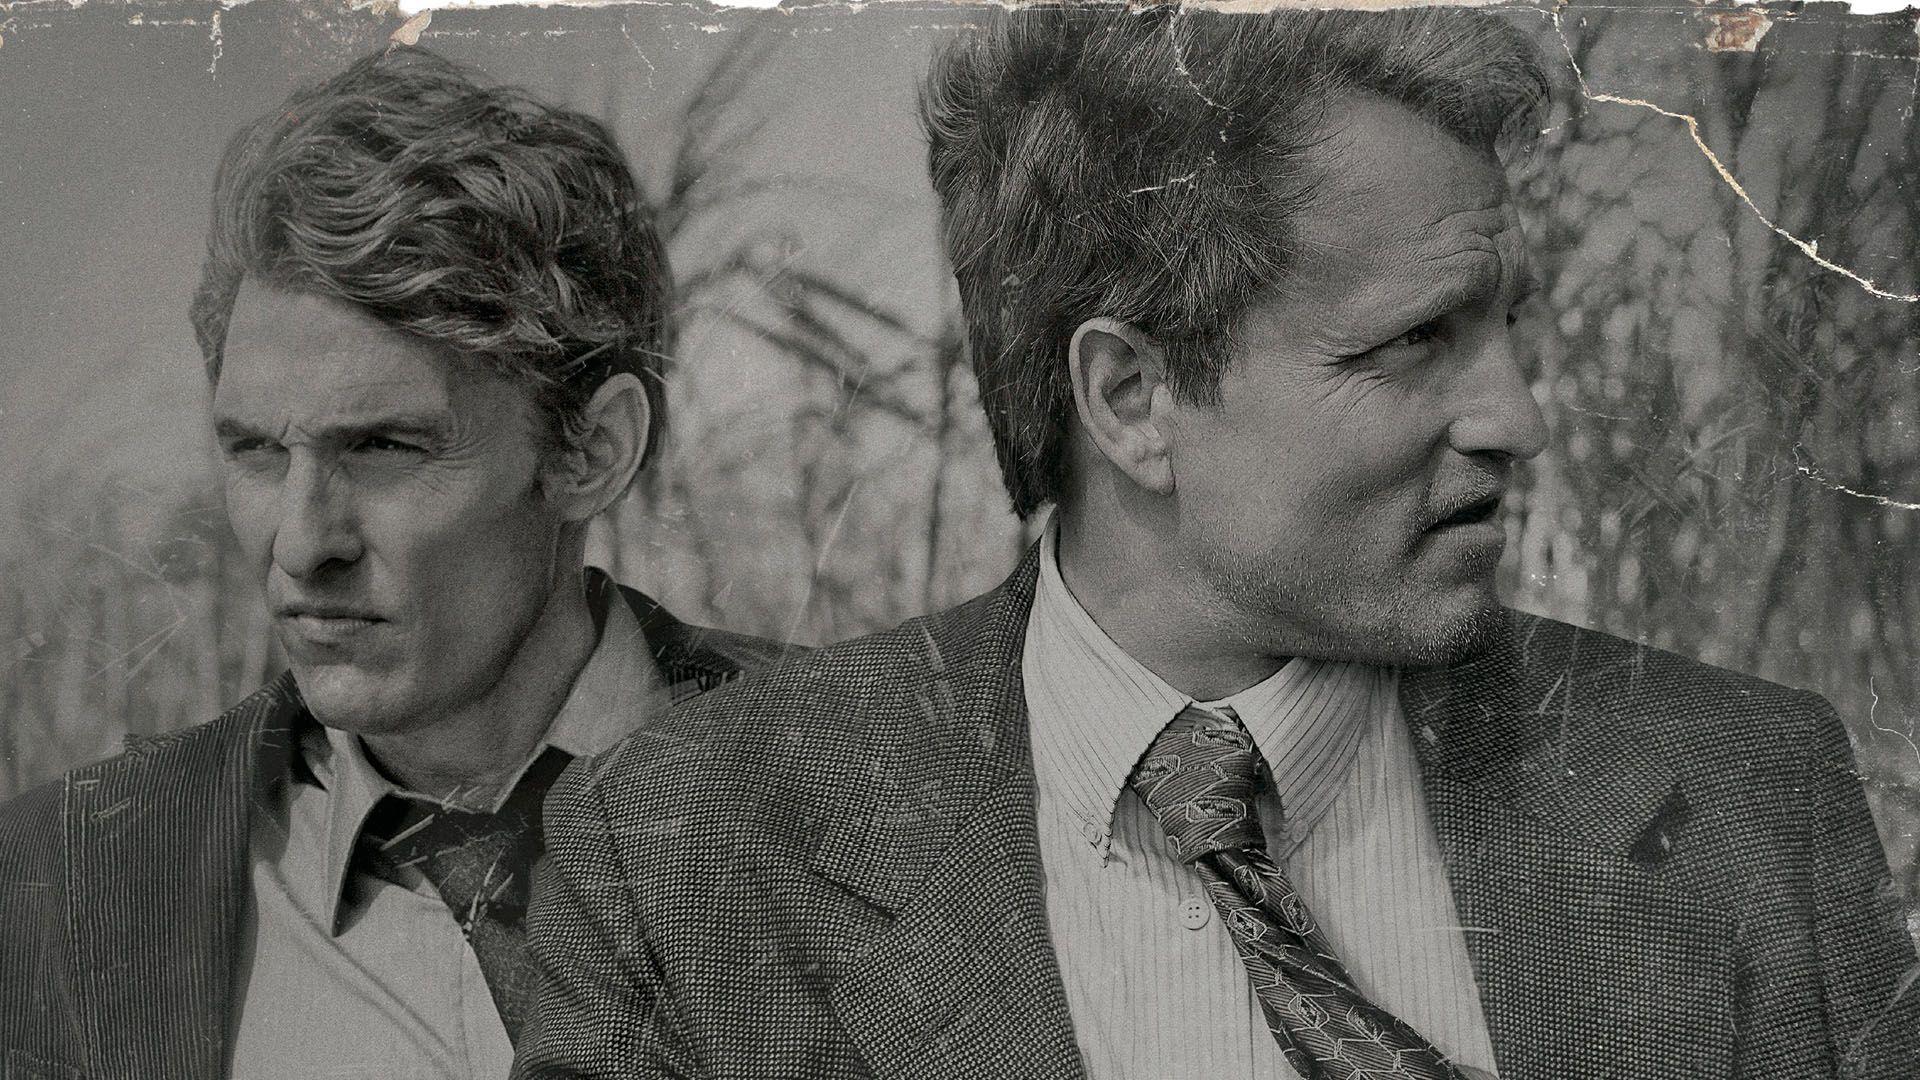 True Detective Wallpapers #1- American TV Series